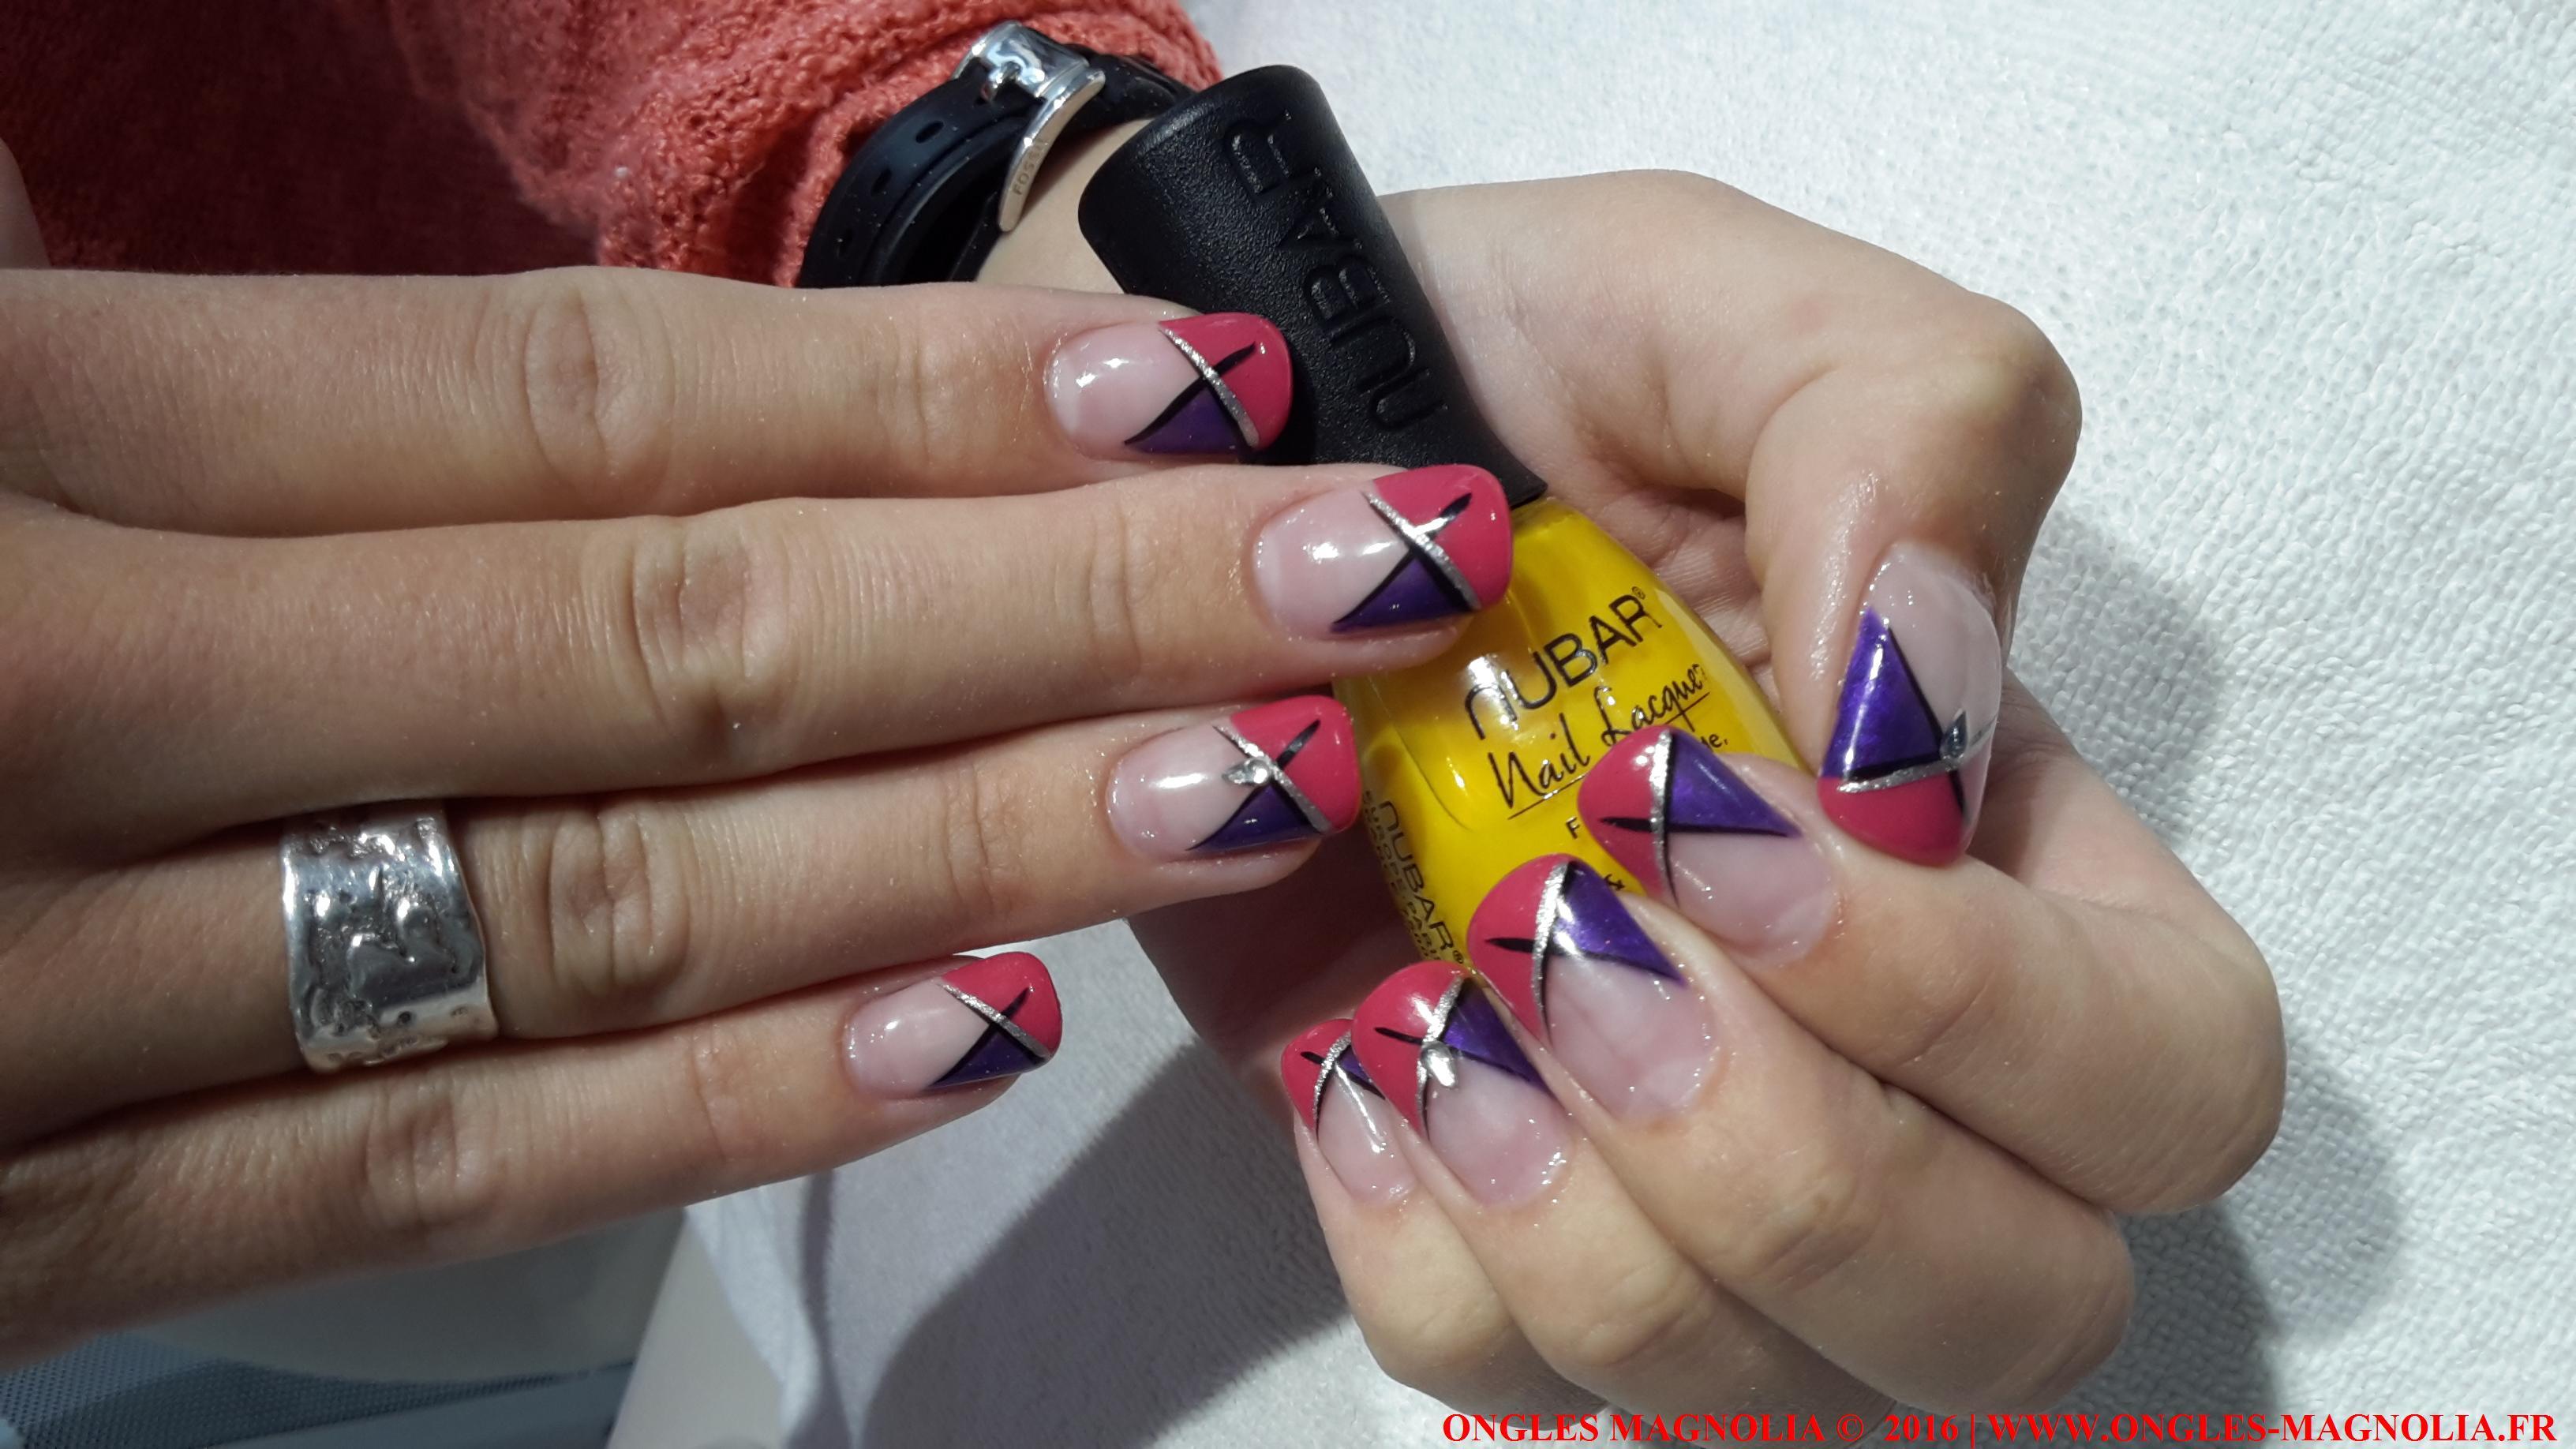 Pose-ongles-nail-art-neuville-sur-saone-lyon-ongles magnolia 012016